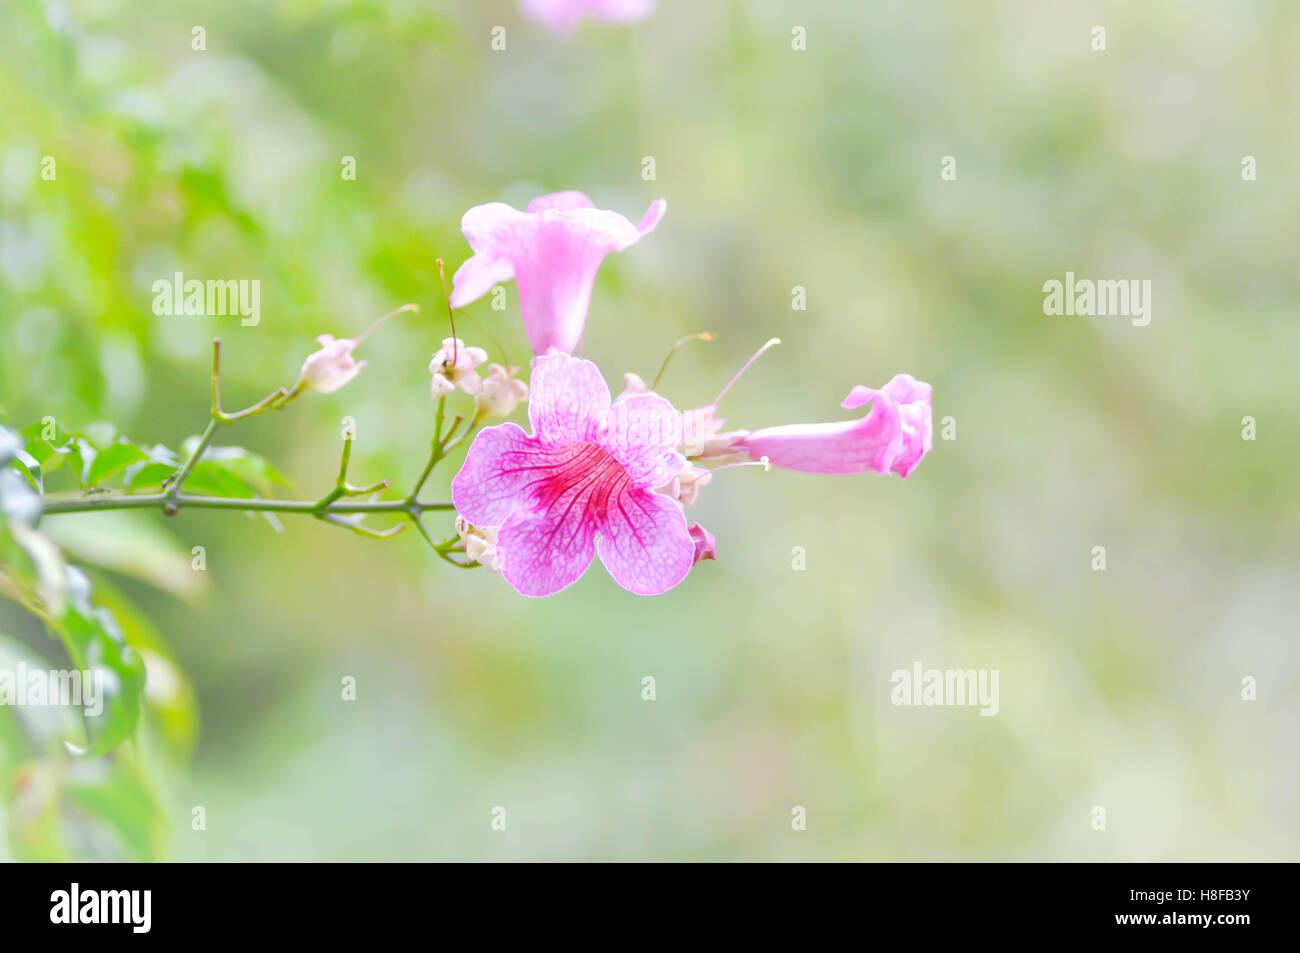 Zimbabwe creeper ,Pink trumpet vine or Trumpet vine flower - Stock Image